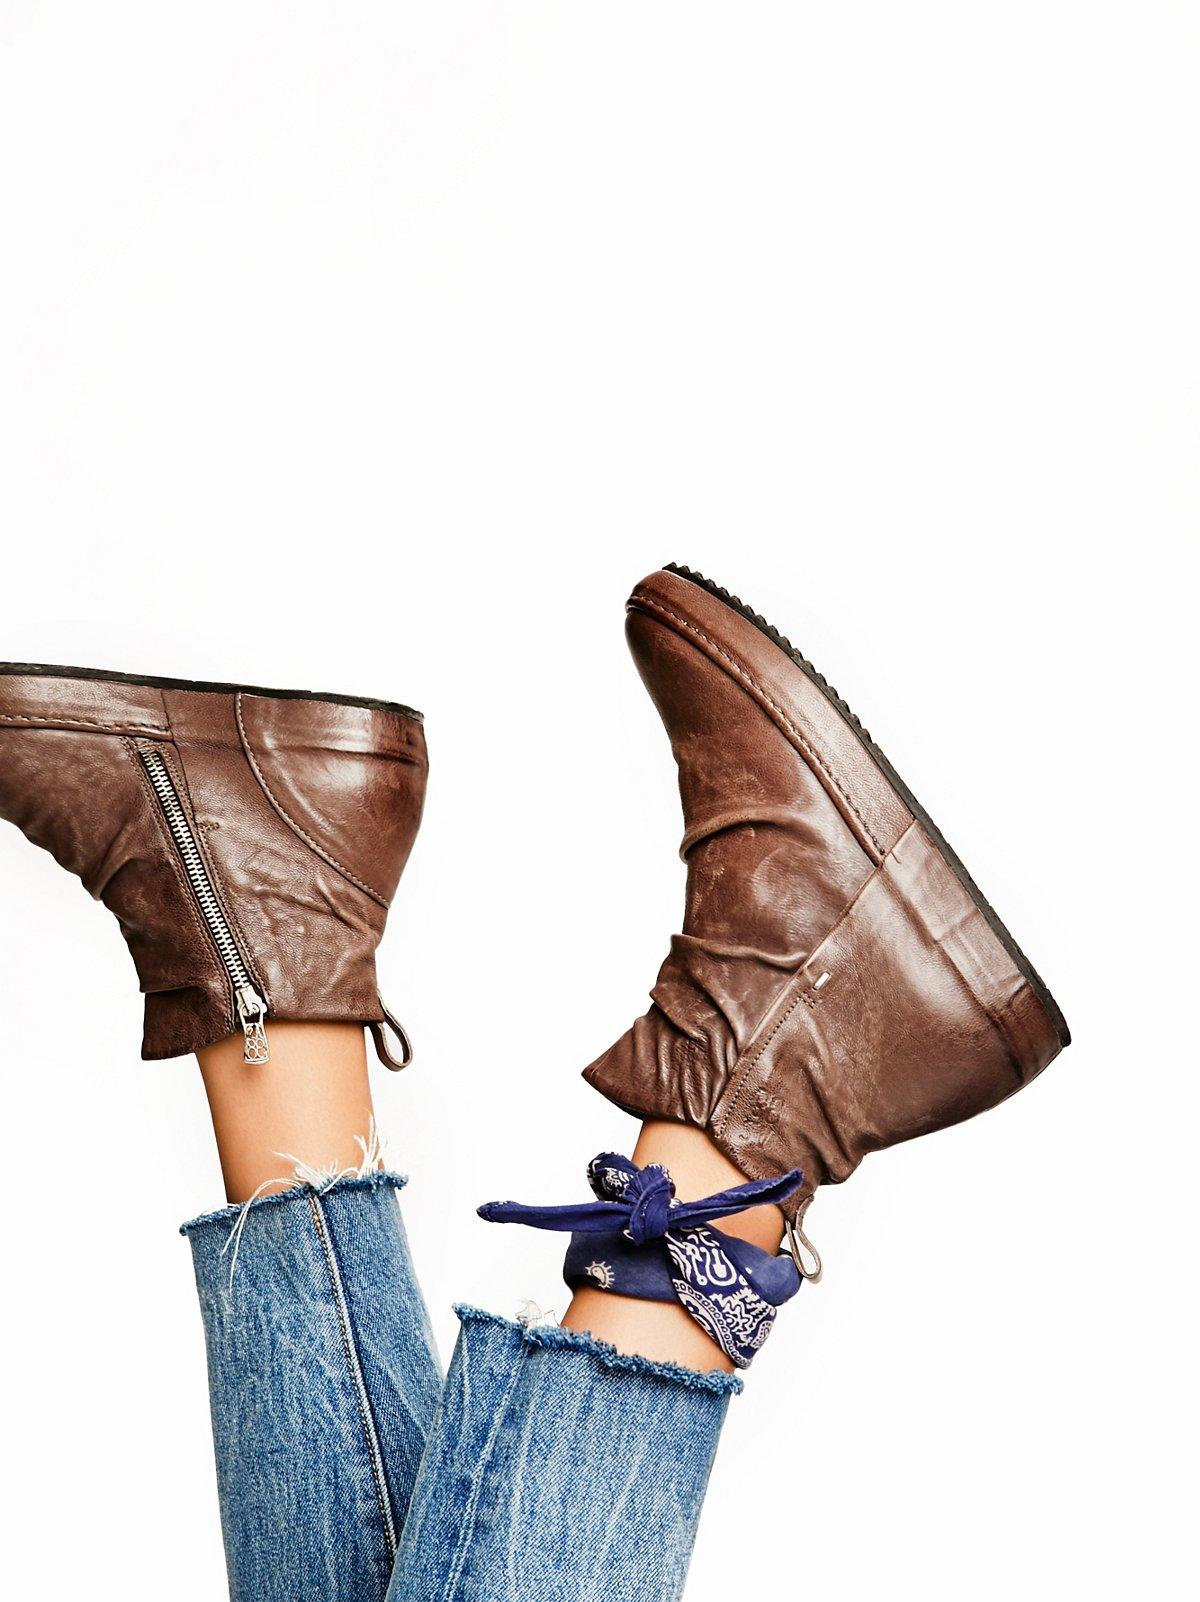 Russell运动鞋